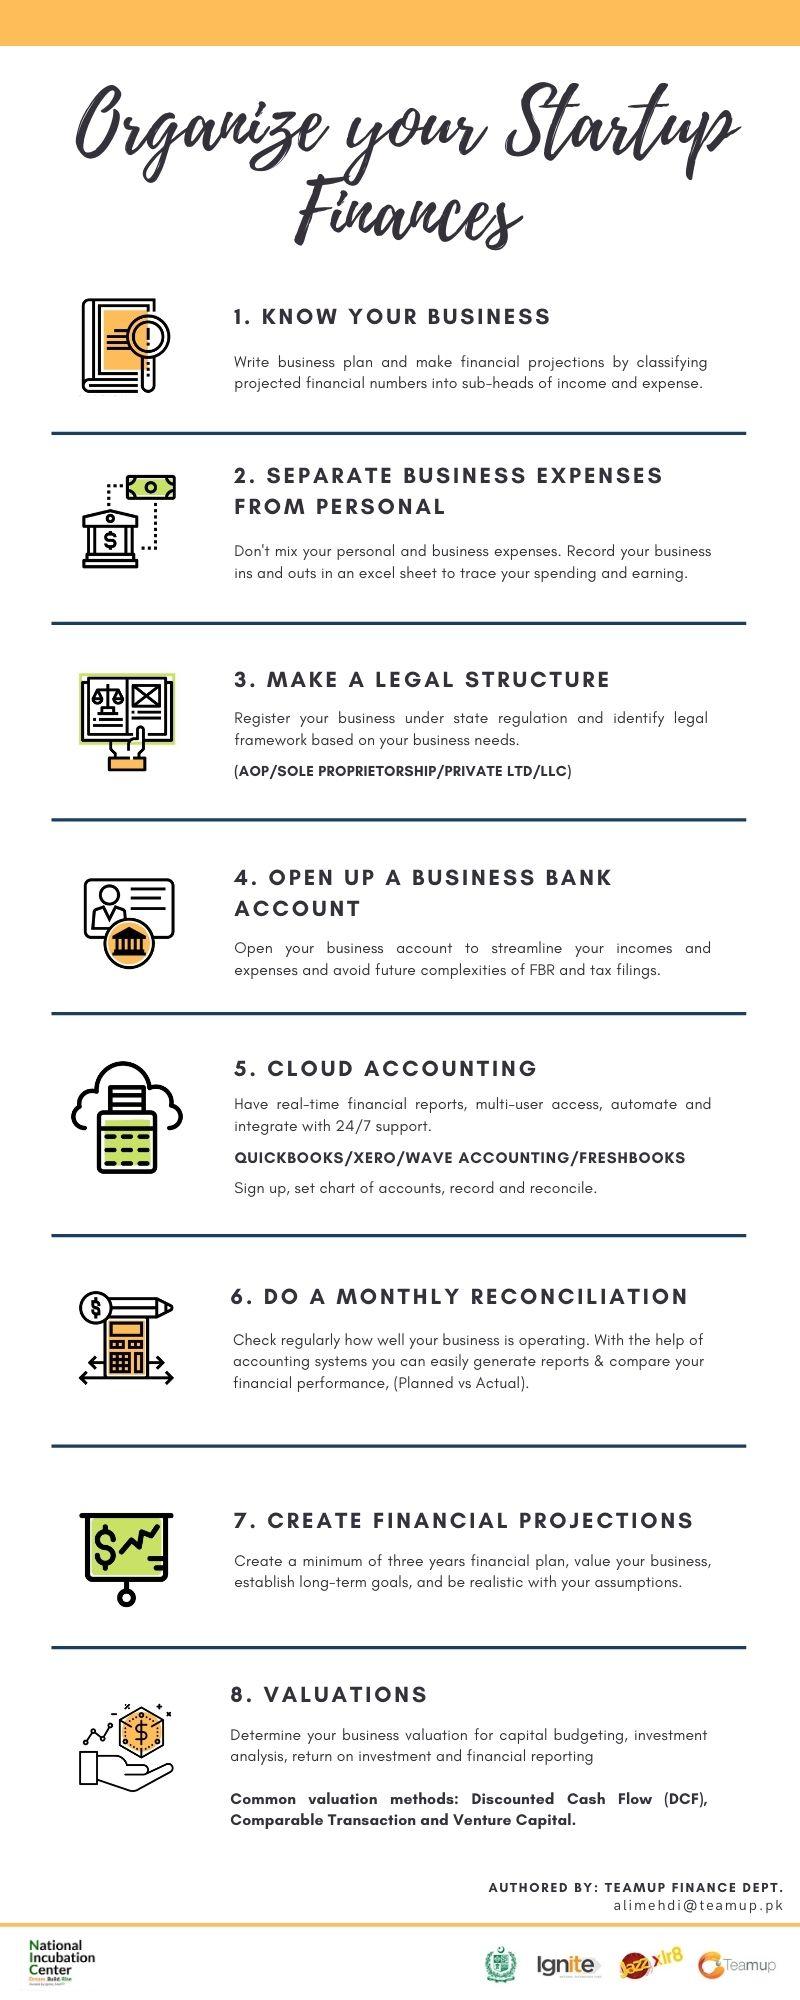 Organize your startup finances